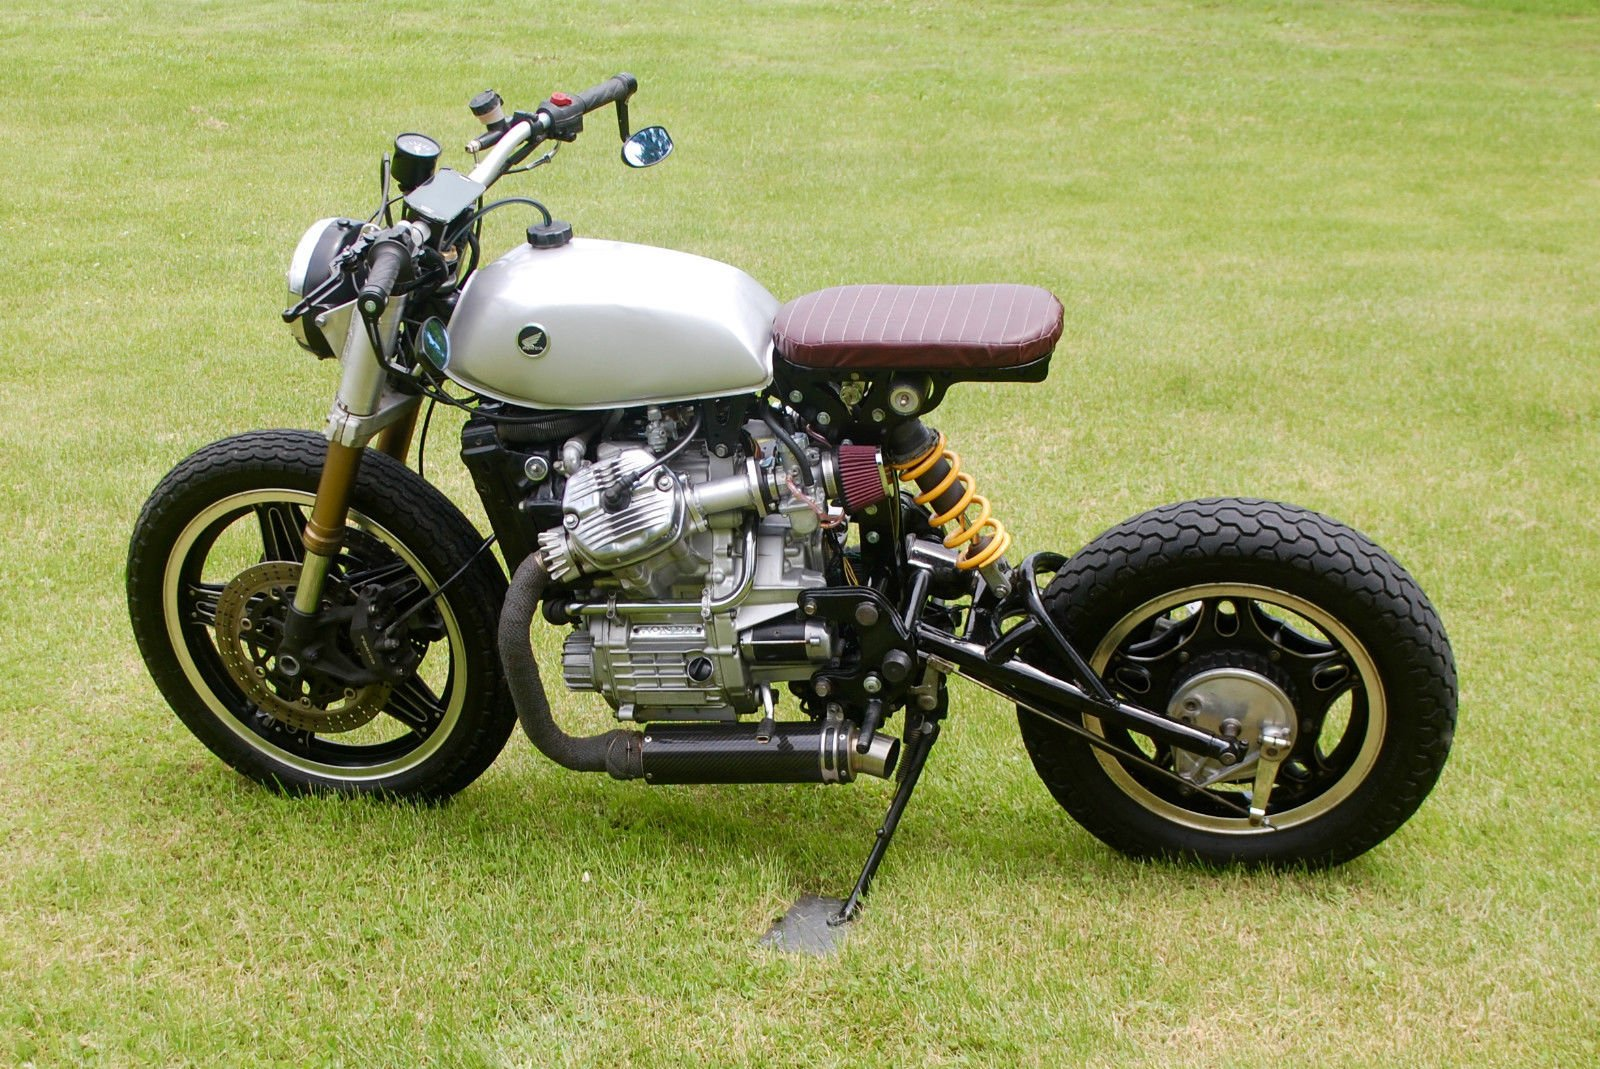 Mono Bobber Cafe Racer Streefighter Motorcycle Custom Motorbike Bike